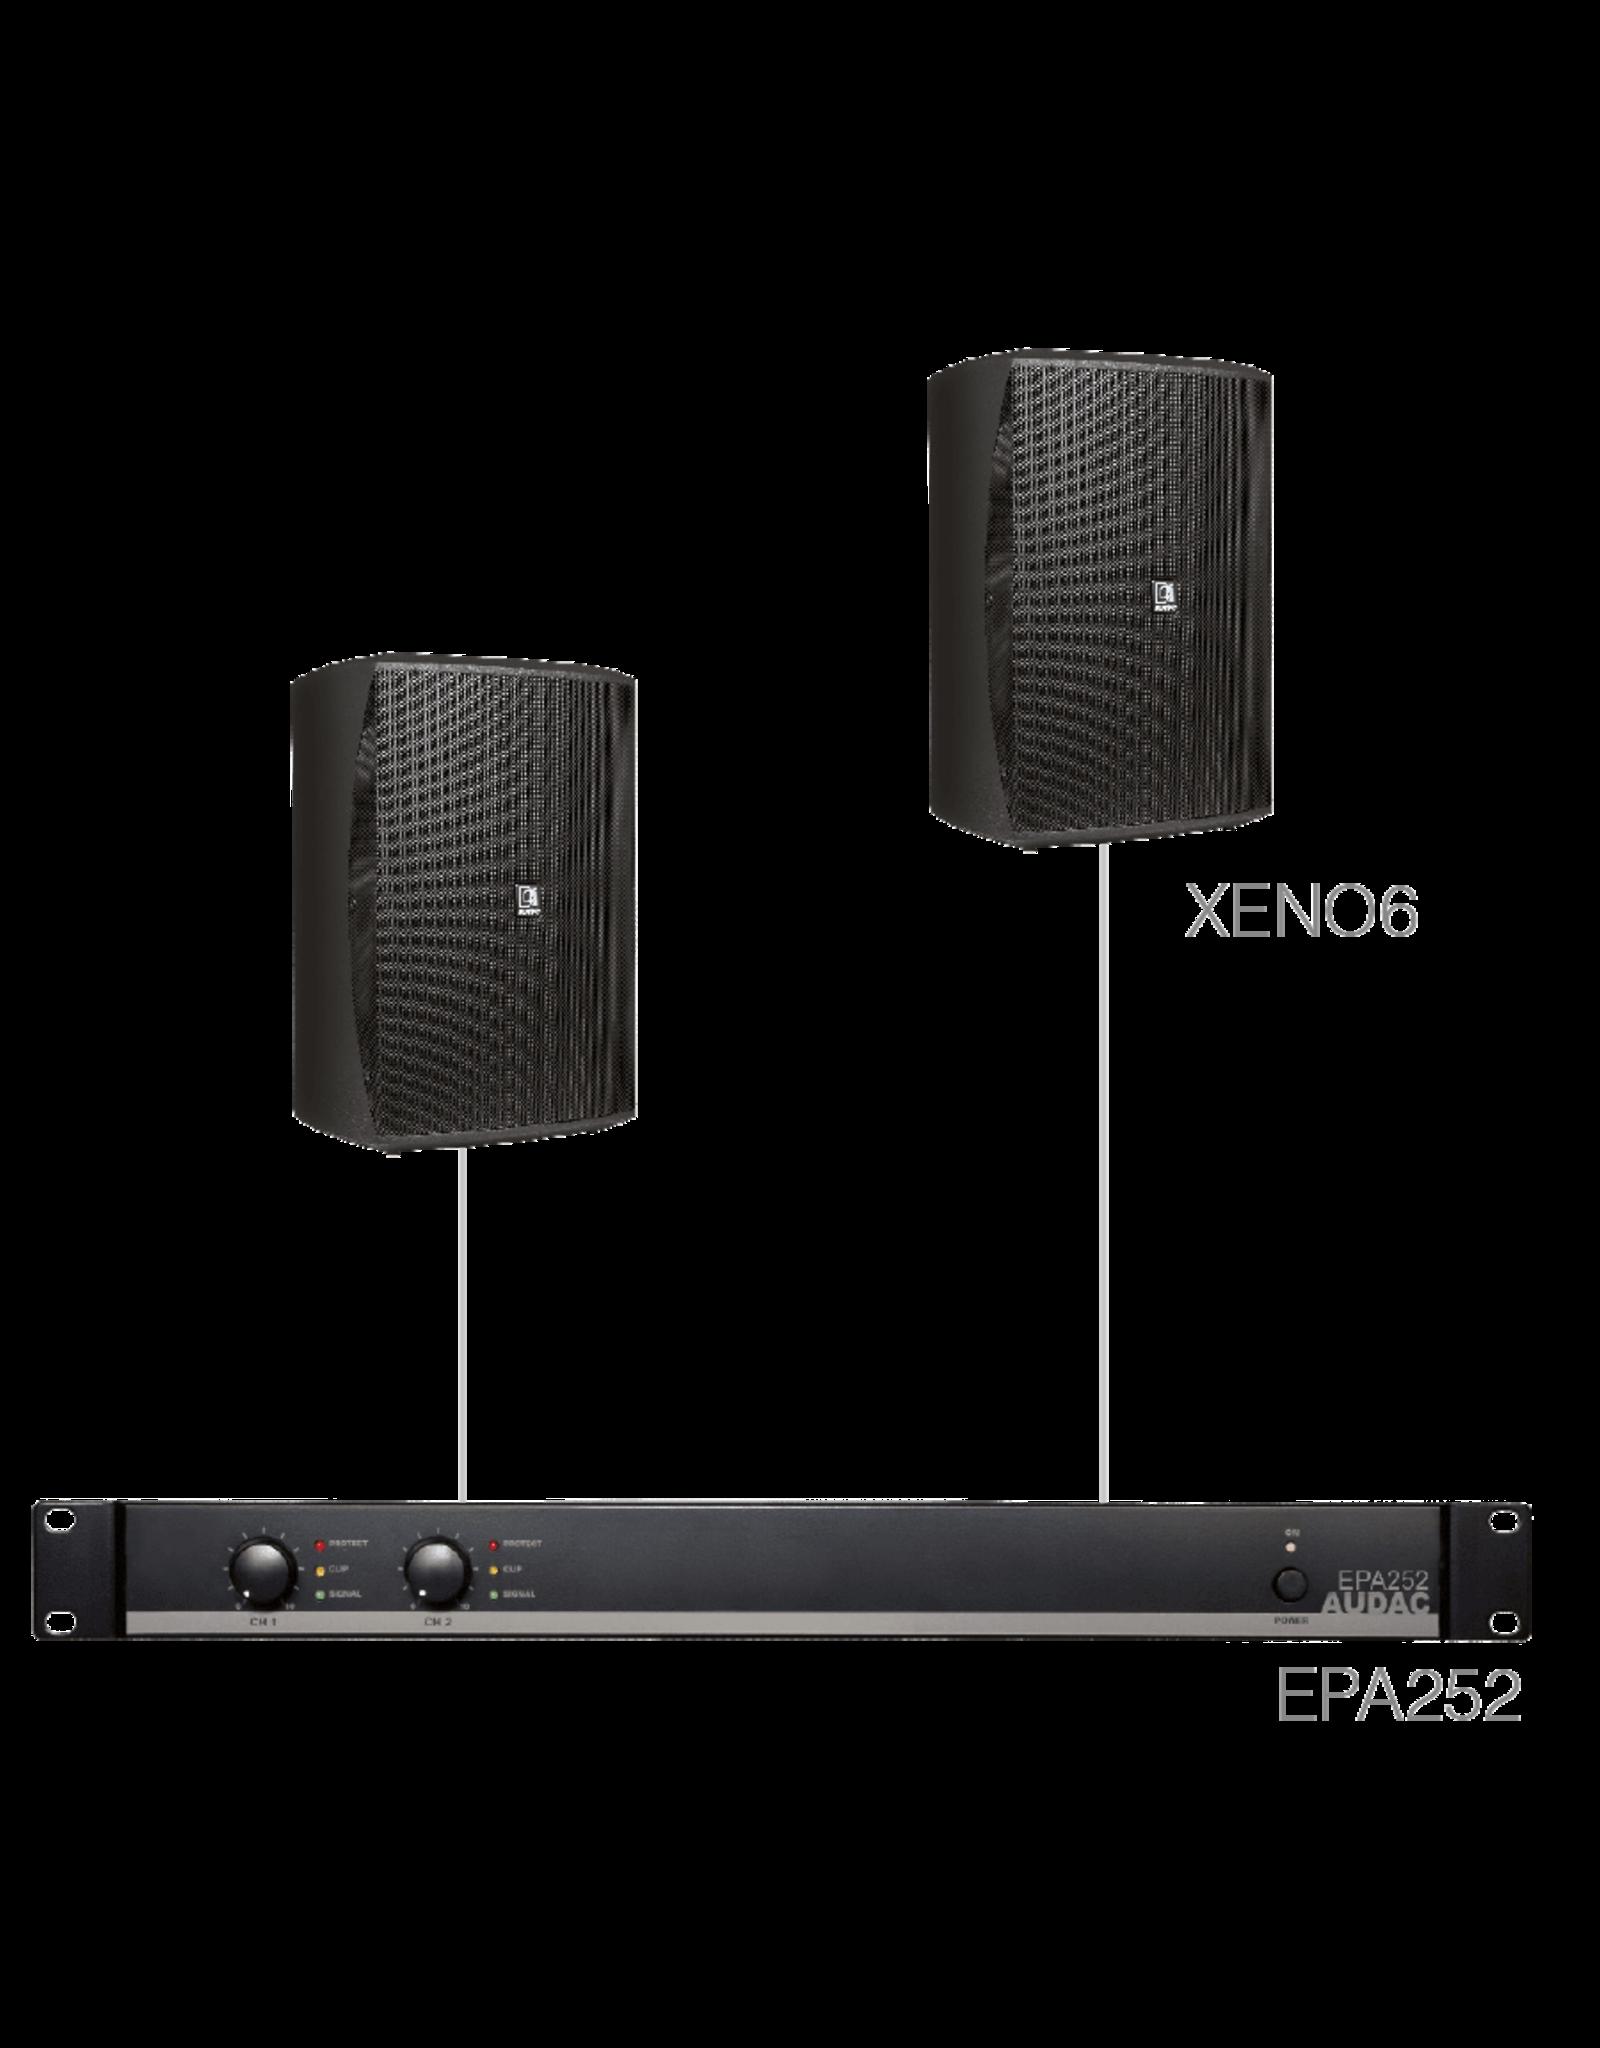 Audac 2 x XENO6 + EPA252 Black